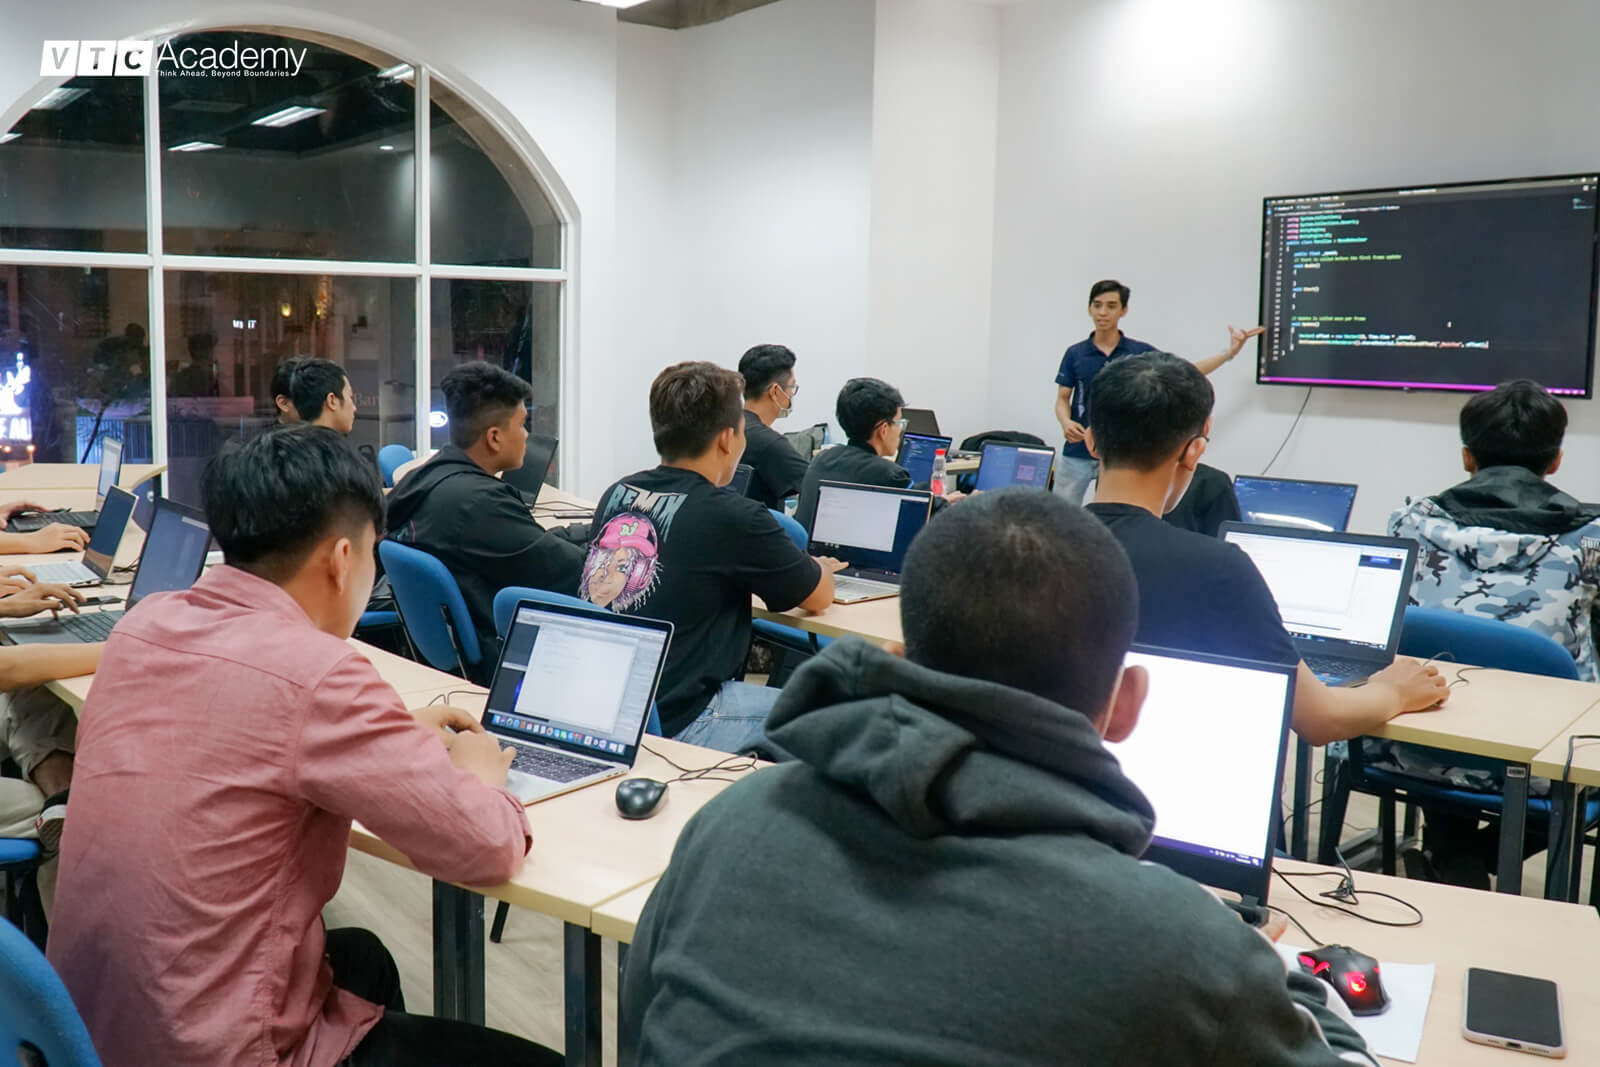 vtc-academy-hoc-thu-lap-trinh-game-3